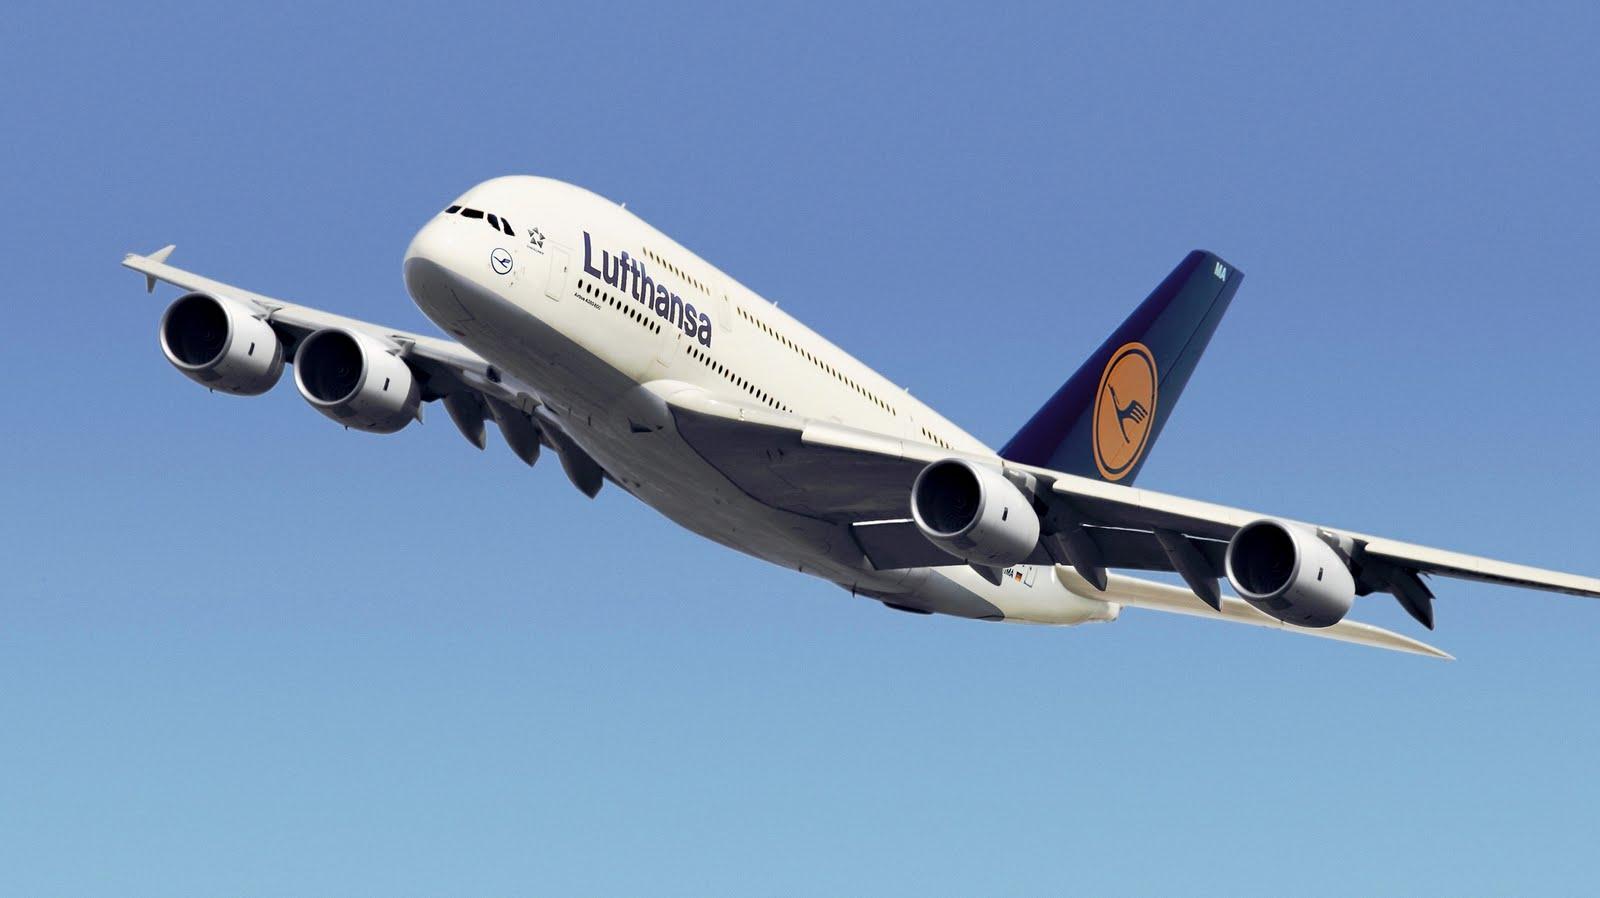 http://4.bp.blogspot.com/-sRdeEAUgYCE/TmOOaB3eoeI/AAAAAAAAGTE/izzLu34saFw/s1600/a380_lufthansa_airlines_germany_764337.jpg